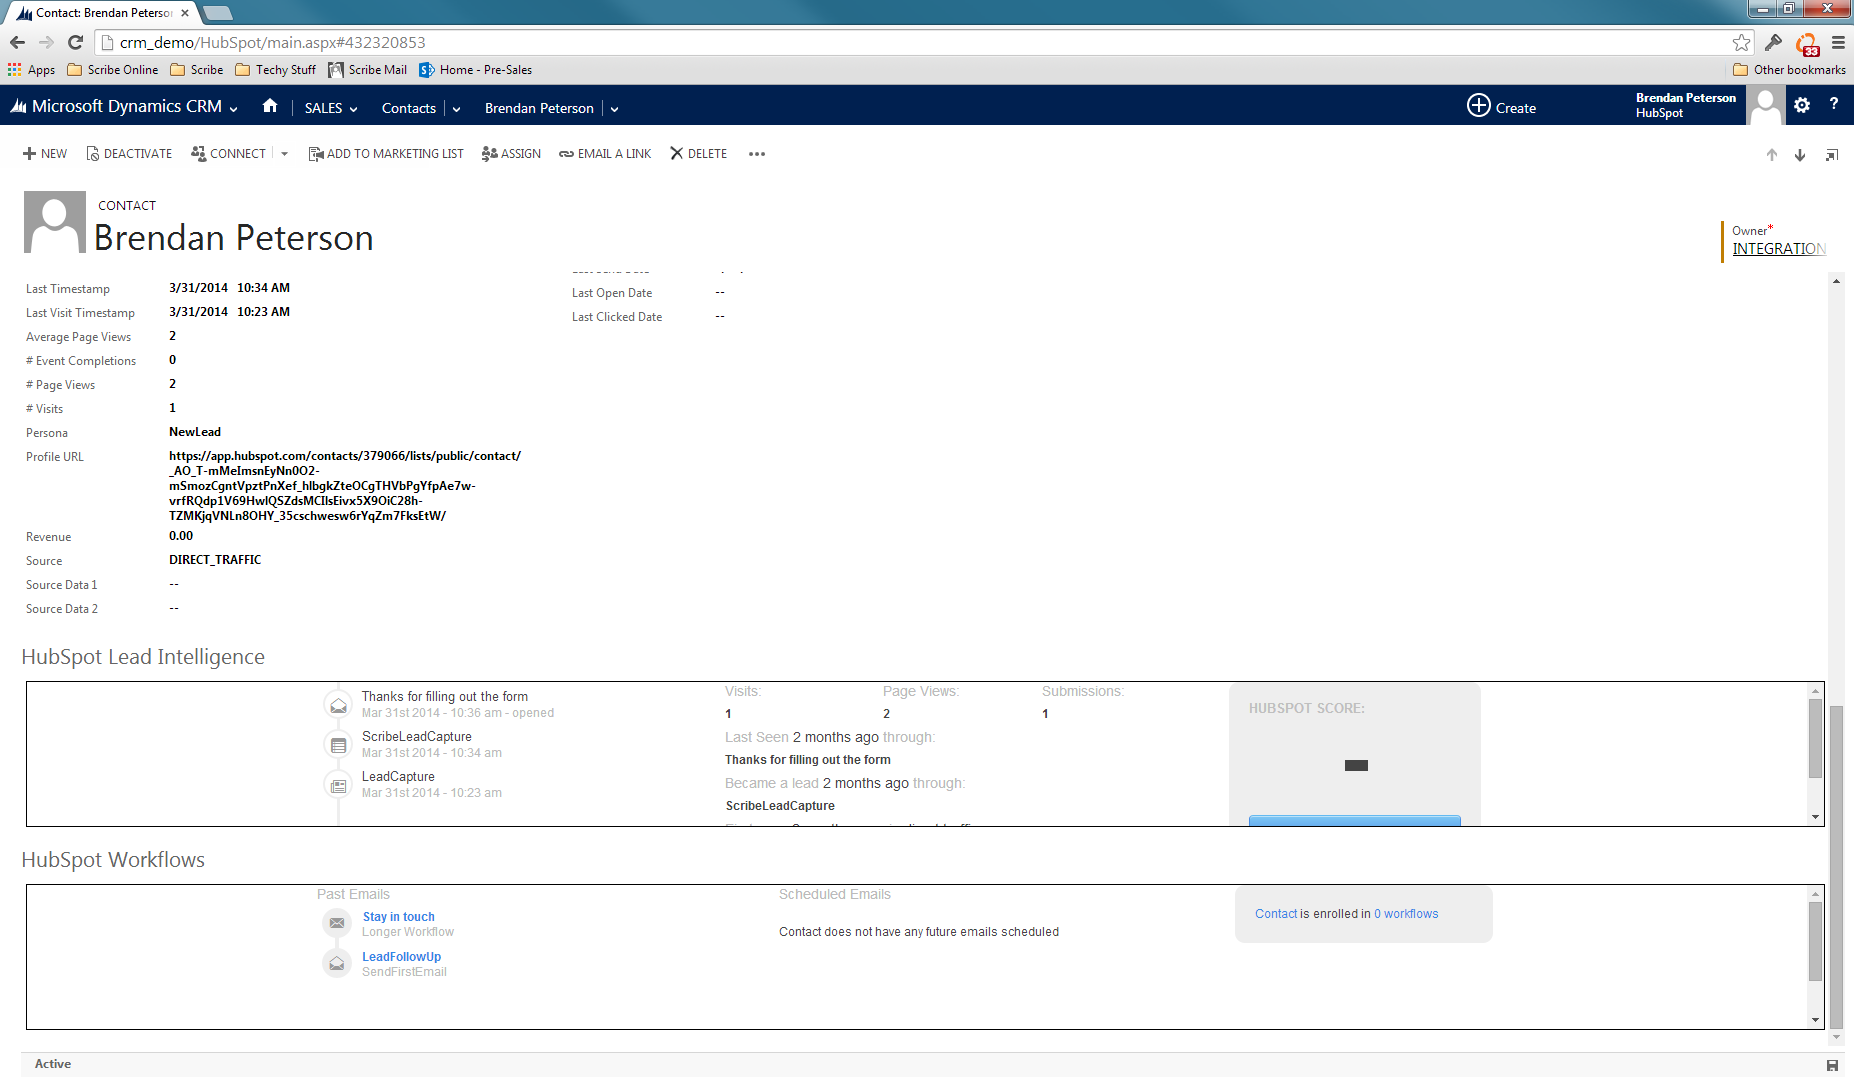 HubSpot Microsoft Dynamics Integration